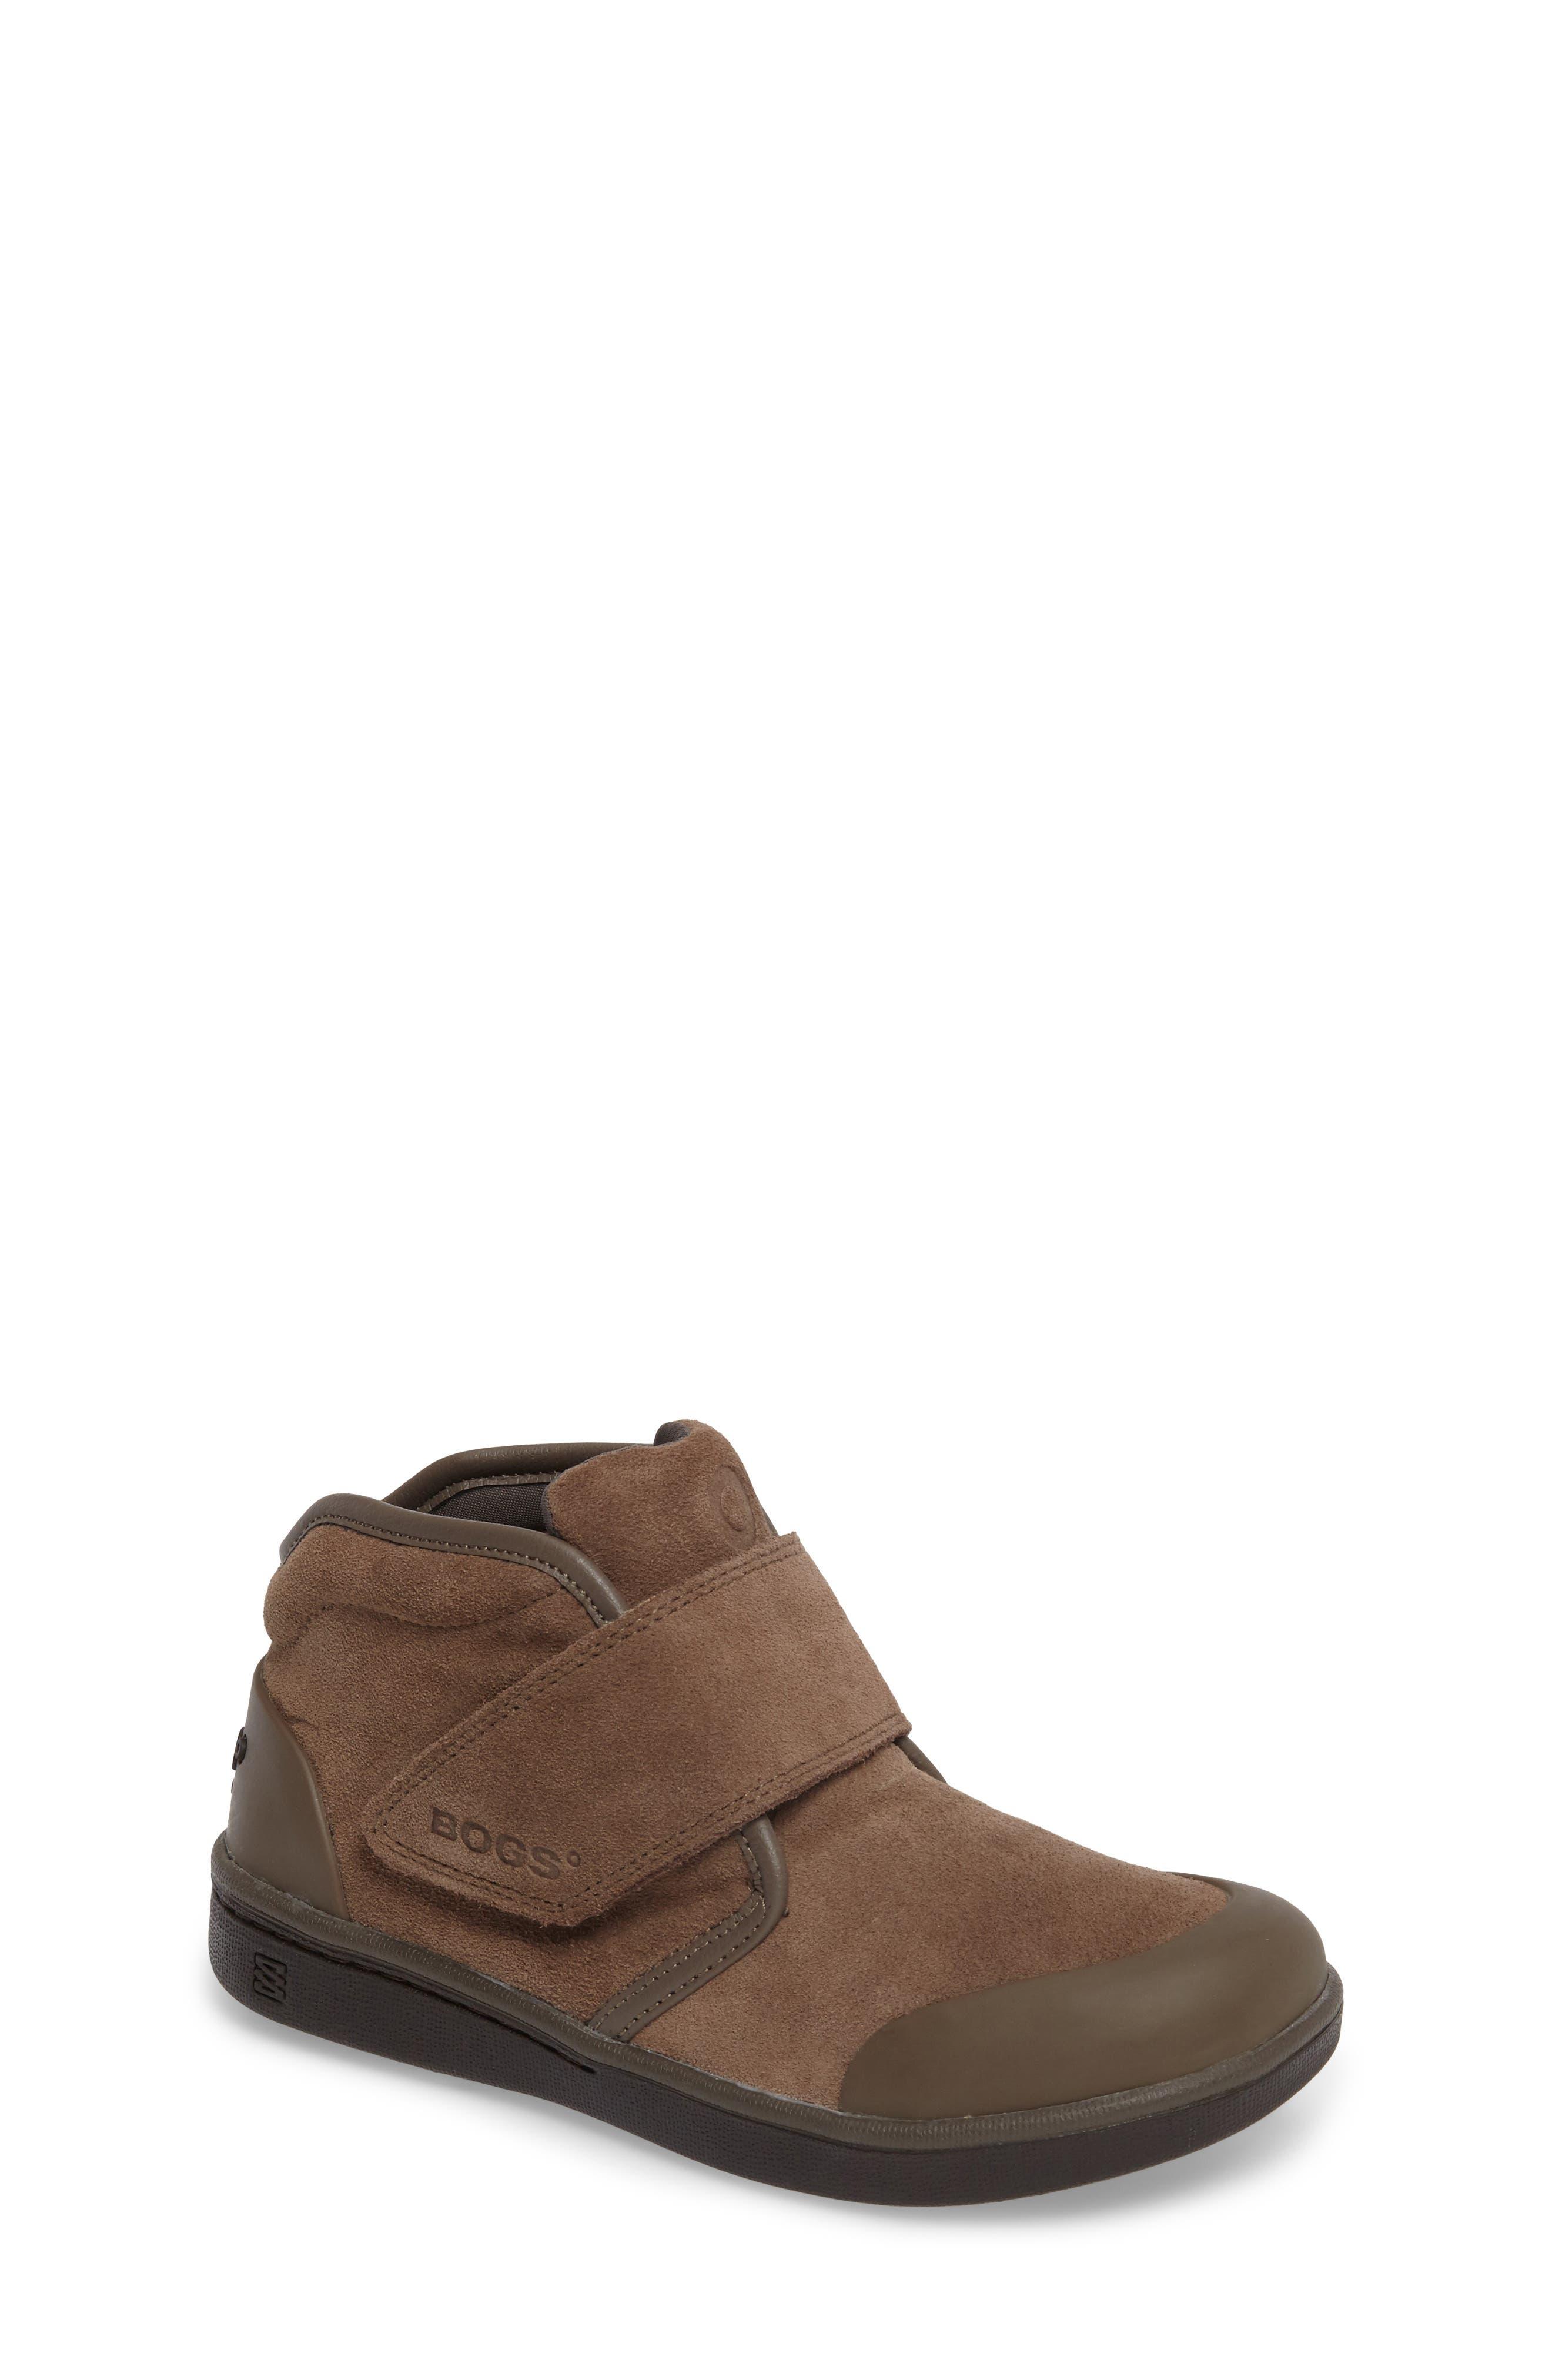 'Sammy' Waterproof Sneaker,                         Main,                         color, TAN